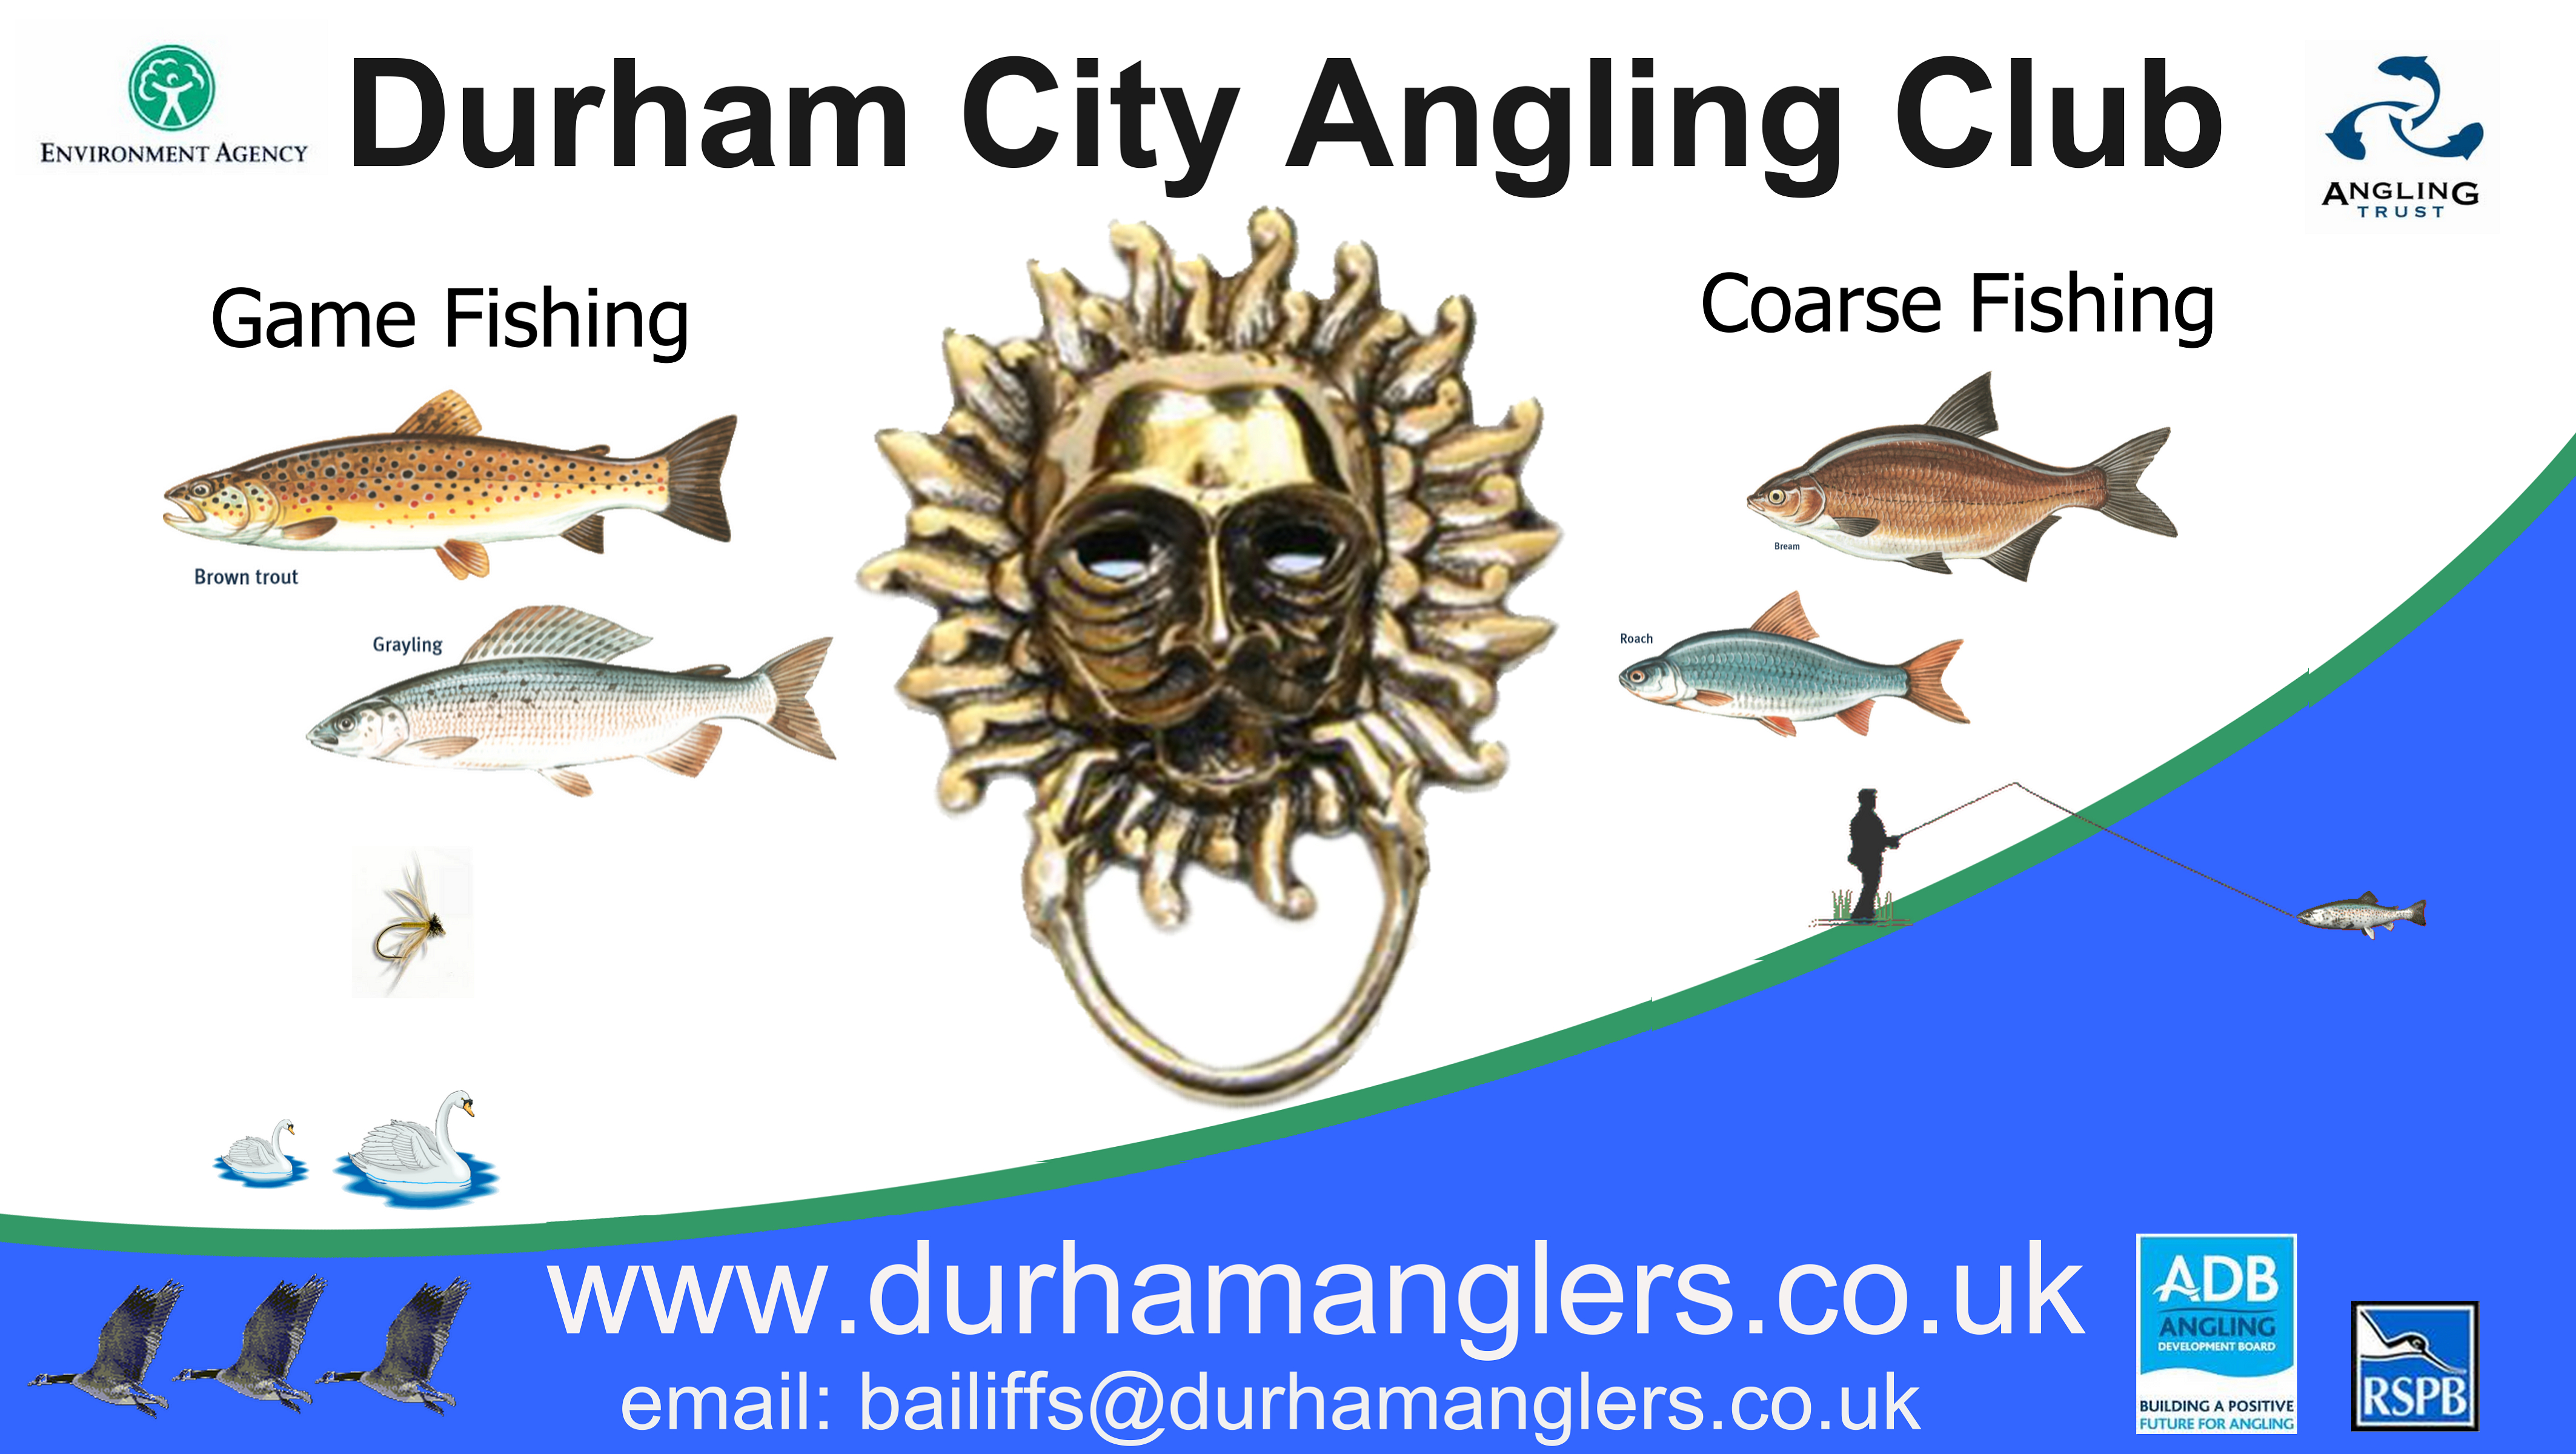 Durham City Angling Club